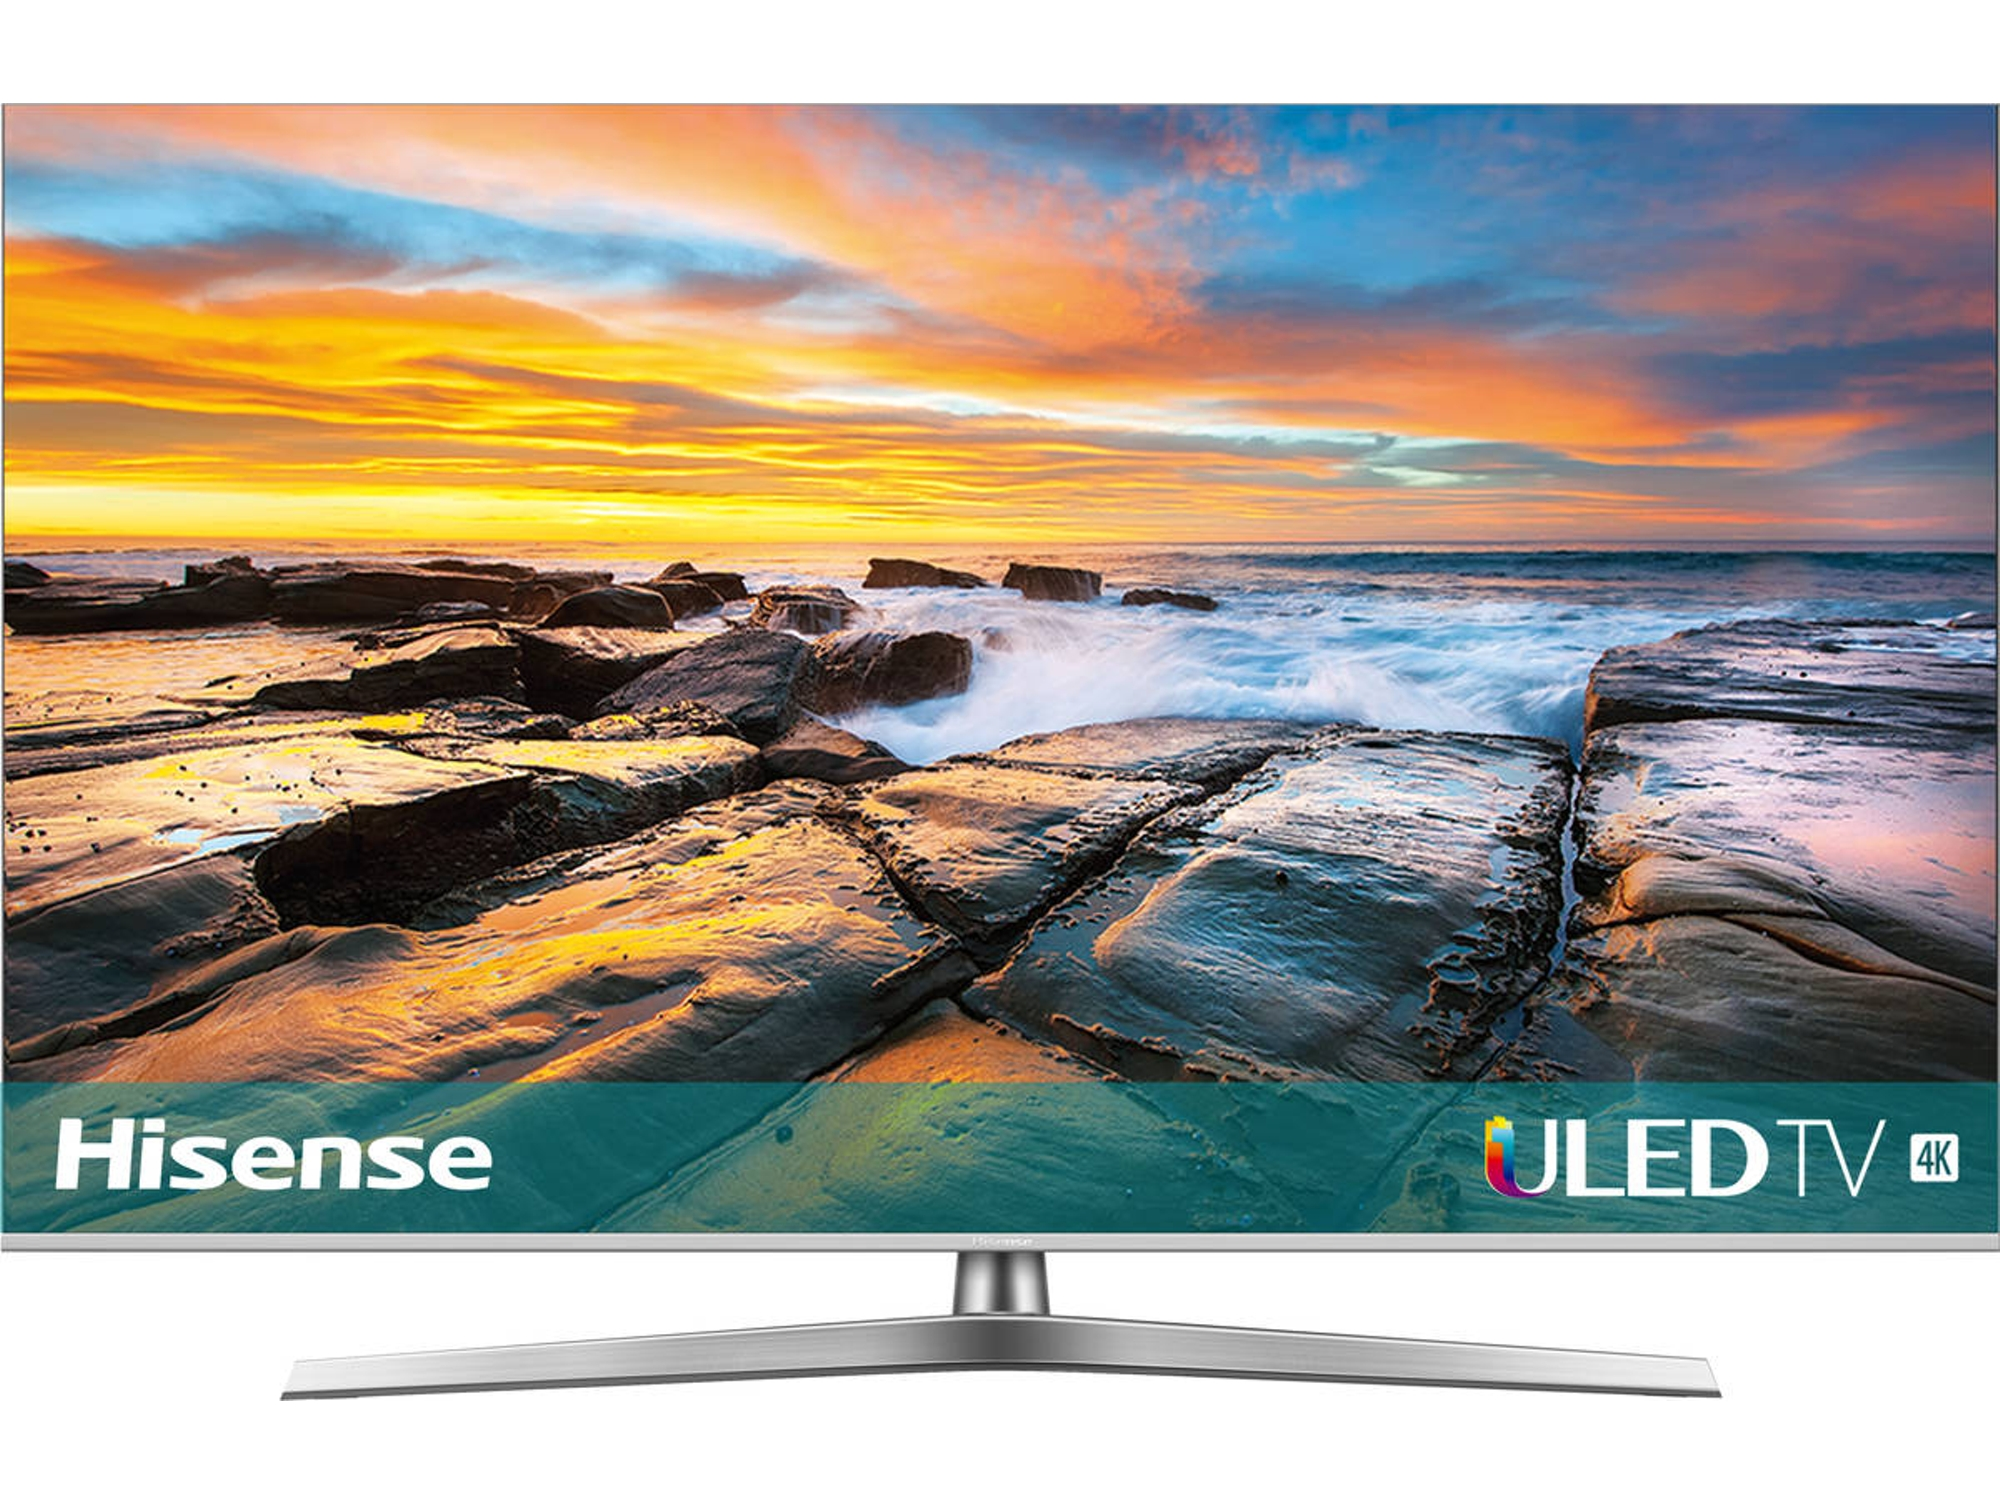 TV HISENSE 65U7B (LED - 65'' - 165 cm - 4K Ultra HD - Smart TV) | Worten.es